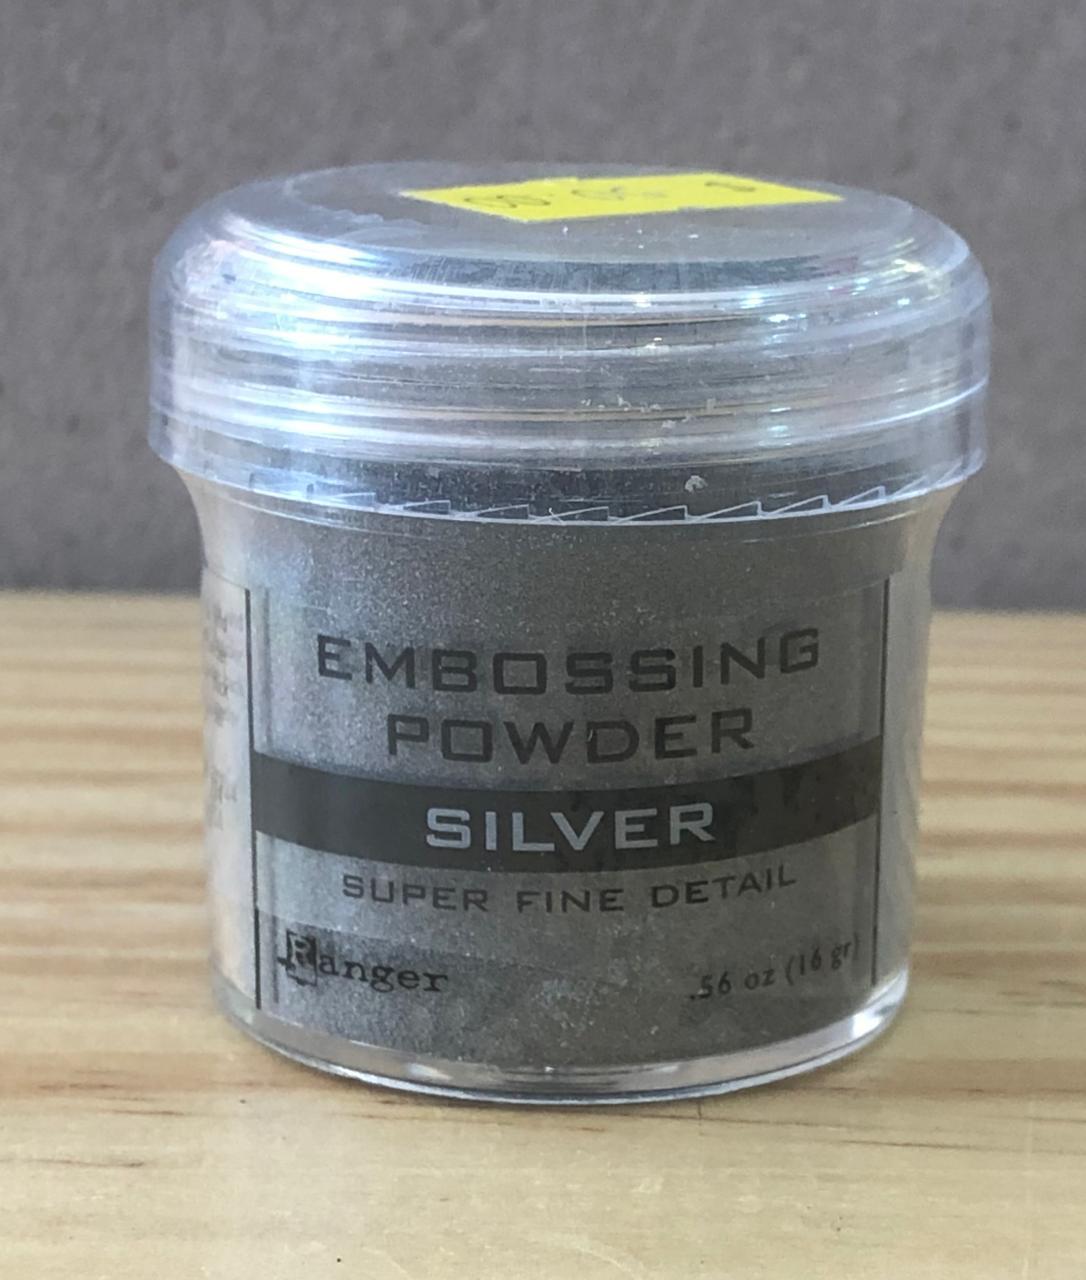 EPJ37415 - Pó Artesanal - Basics Embossing Powders 1 oz. Jar - Super Fine Silver